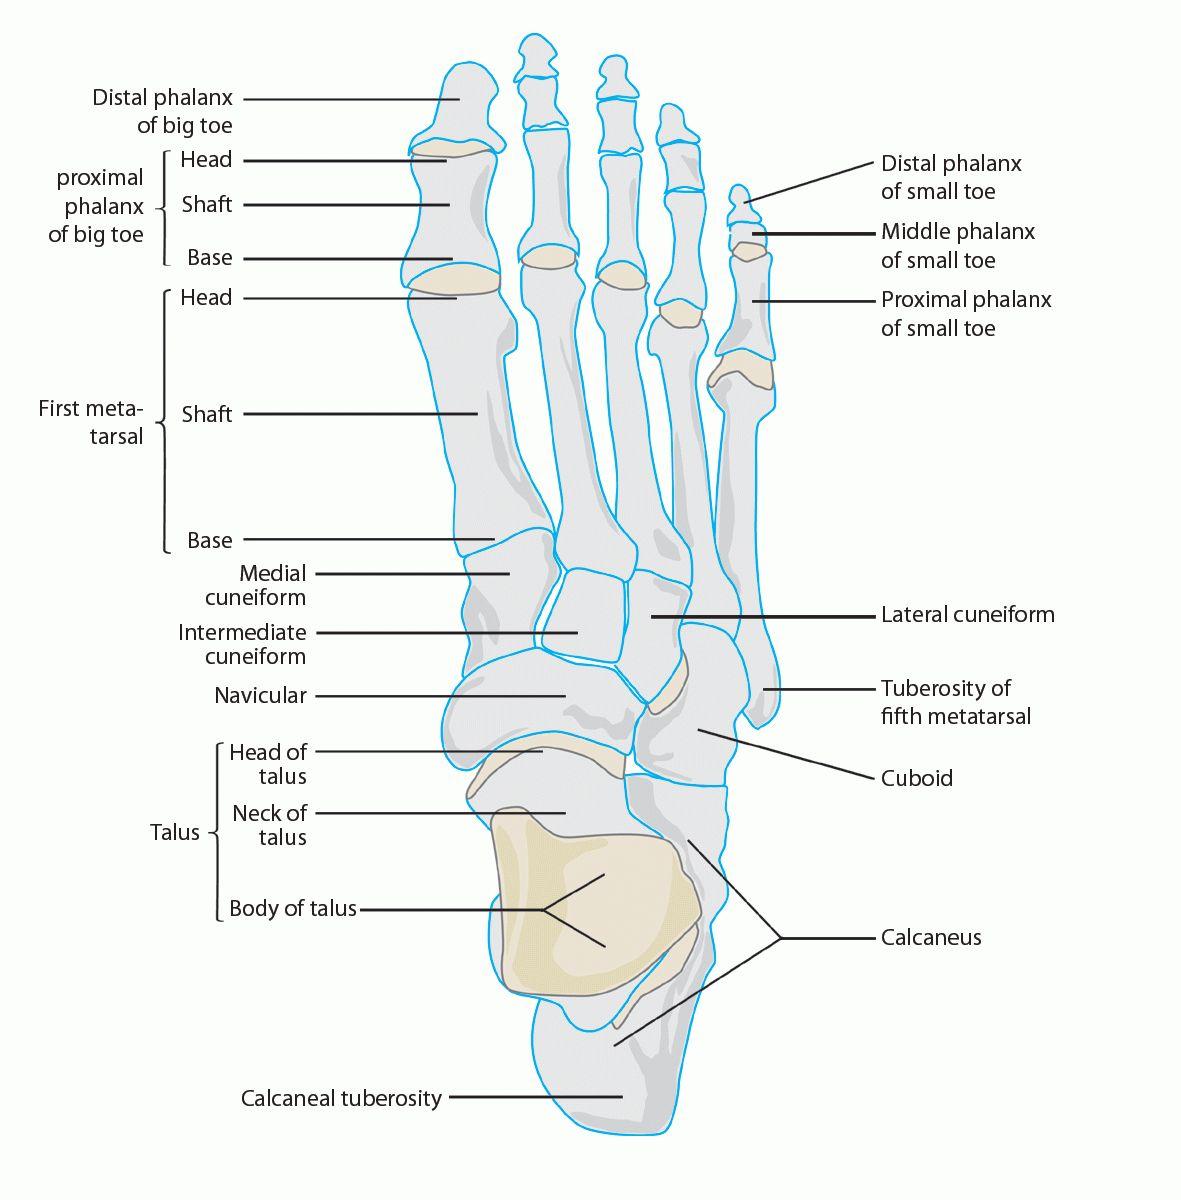 Foot anatomy in detail anatomynote.com | Human Body Anatomy | Pinterest